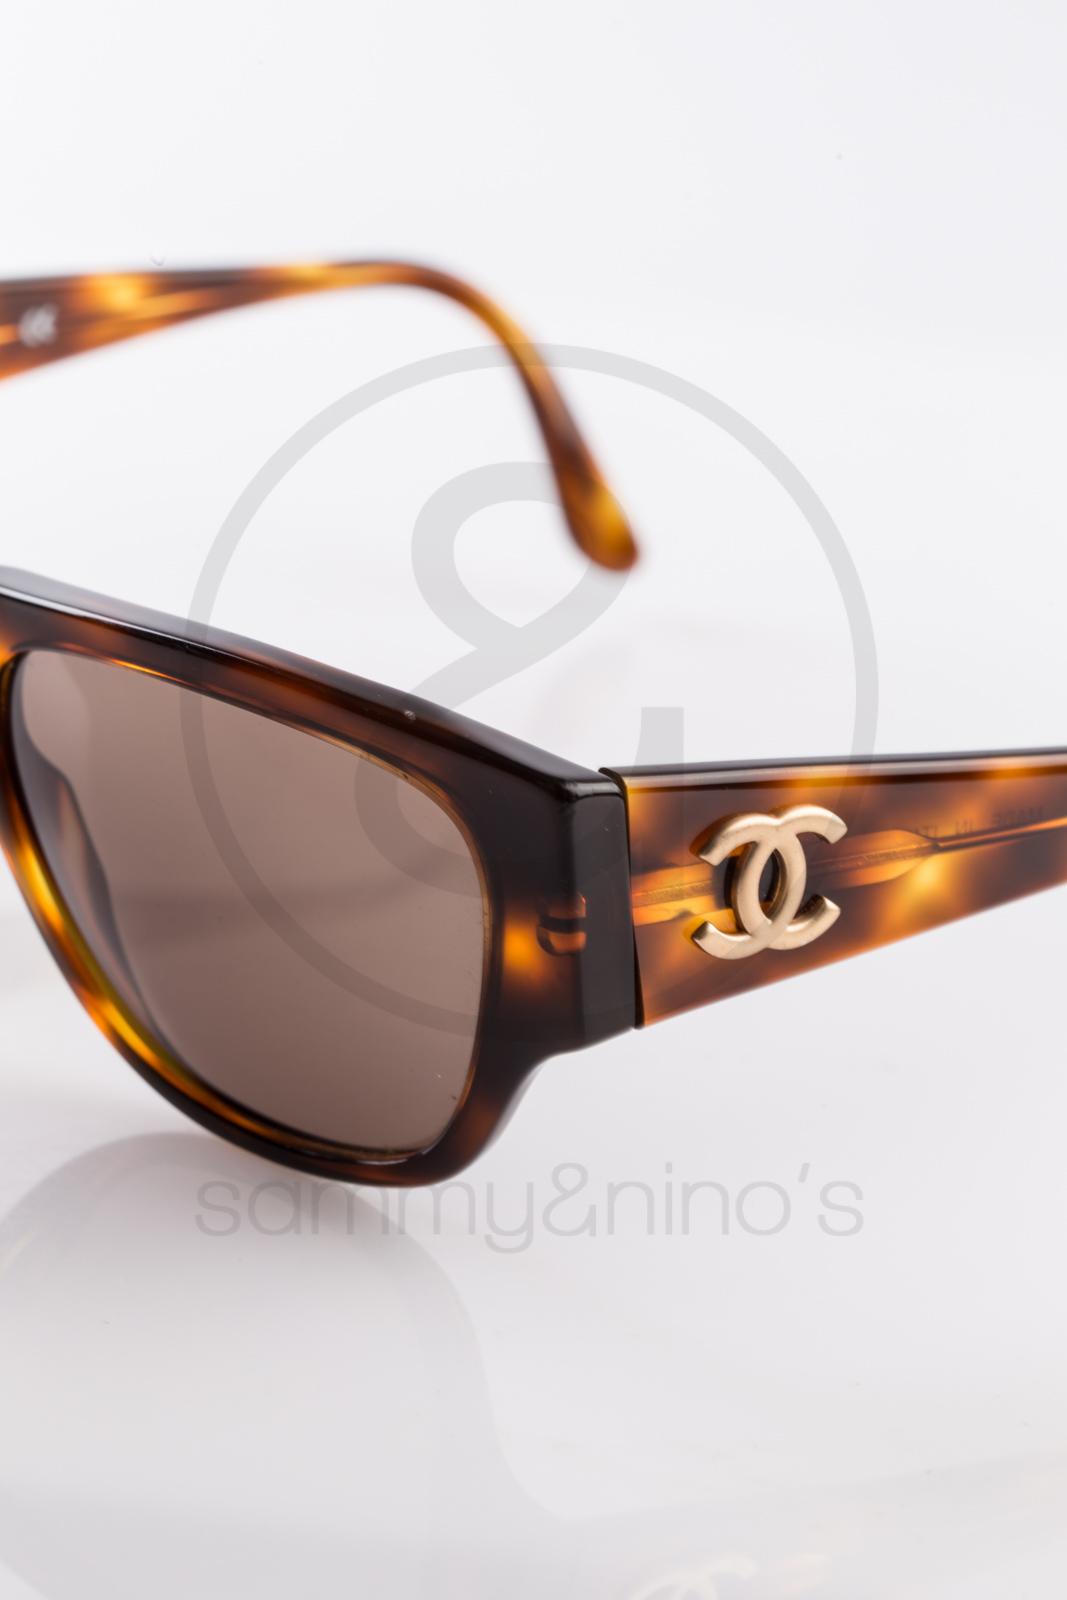 Gold Frame Chanel Sunglasses : Chanel 04153 Sammy & Ninos Store